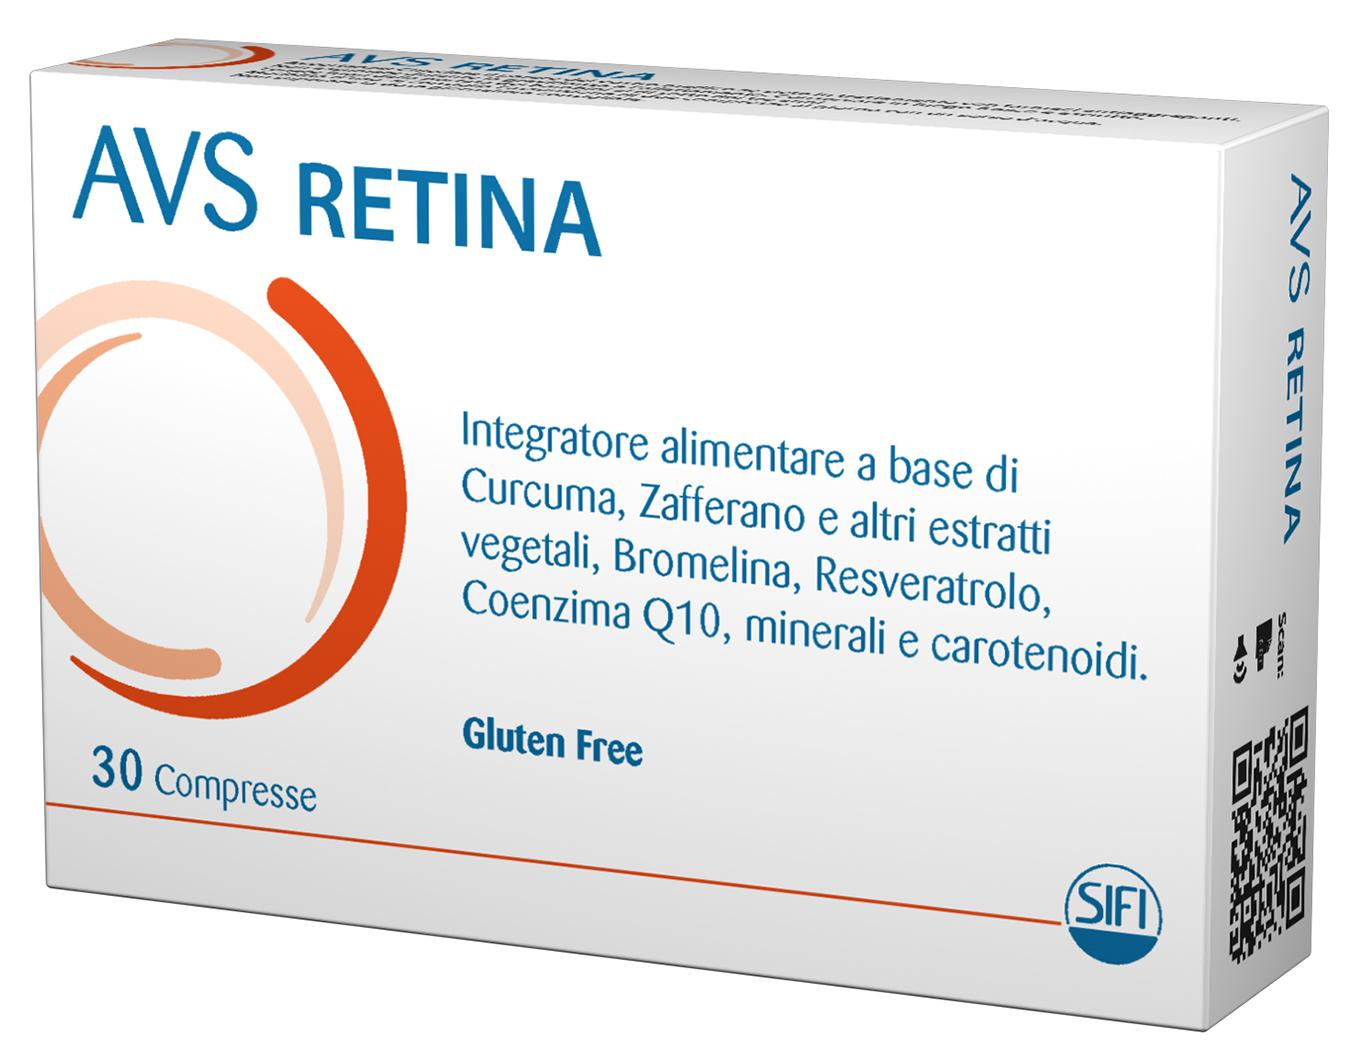 AVS Retina